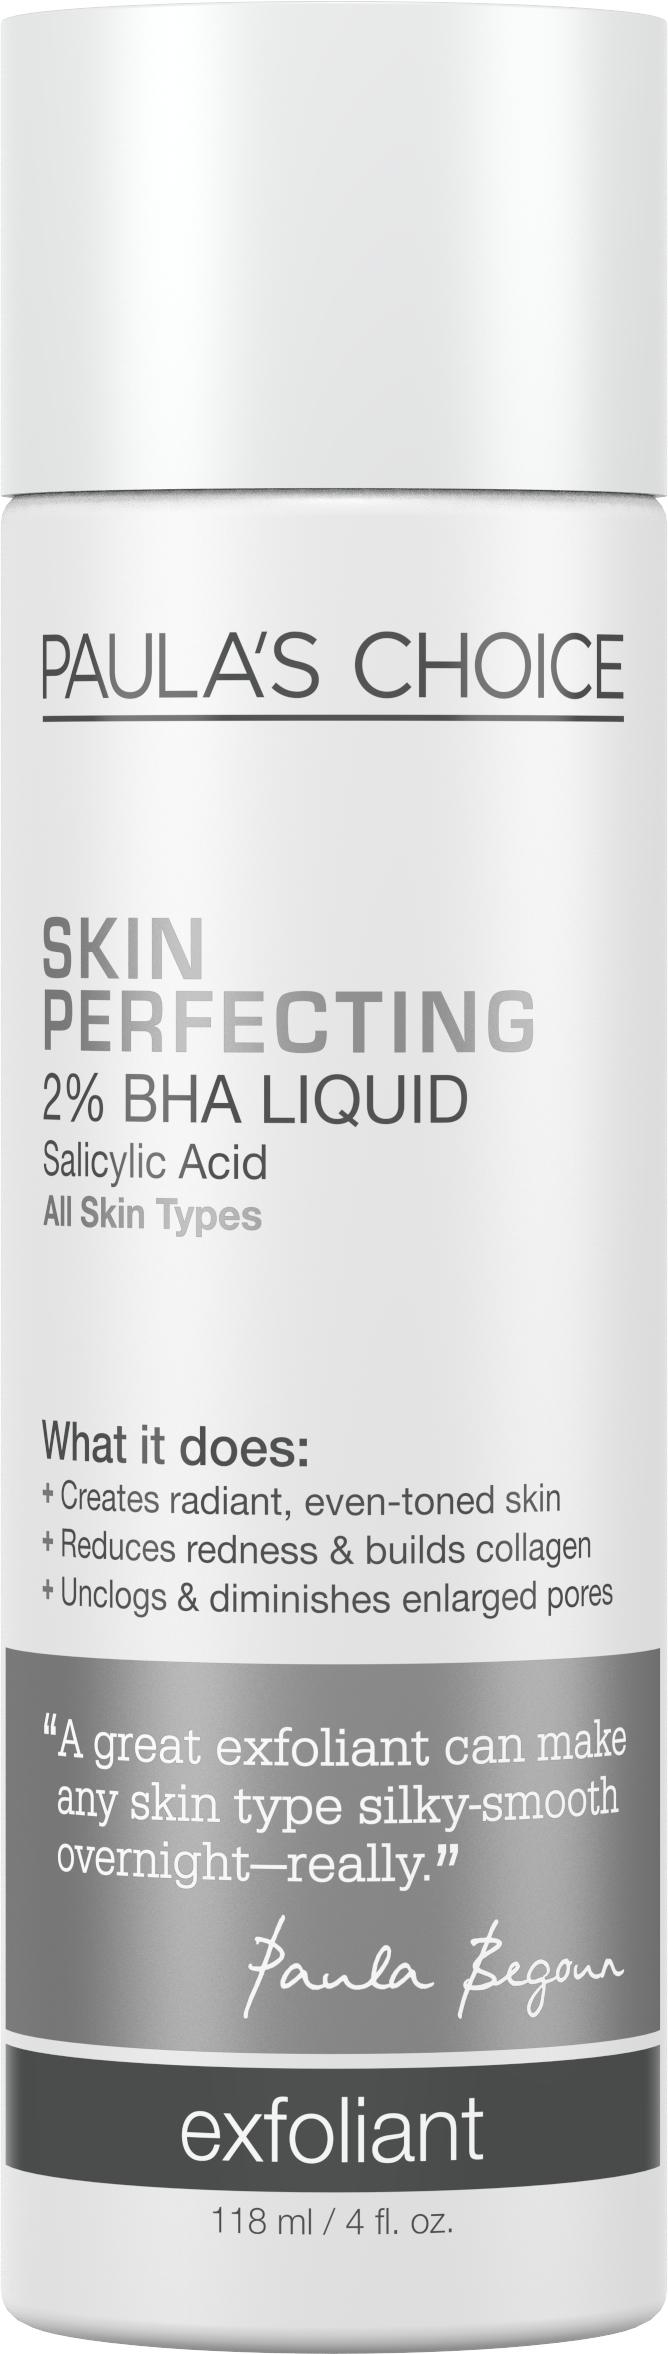 PC_Skin Perfecting 2% BHA Liquid